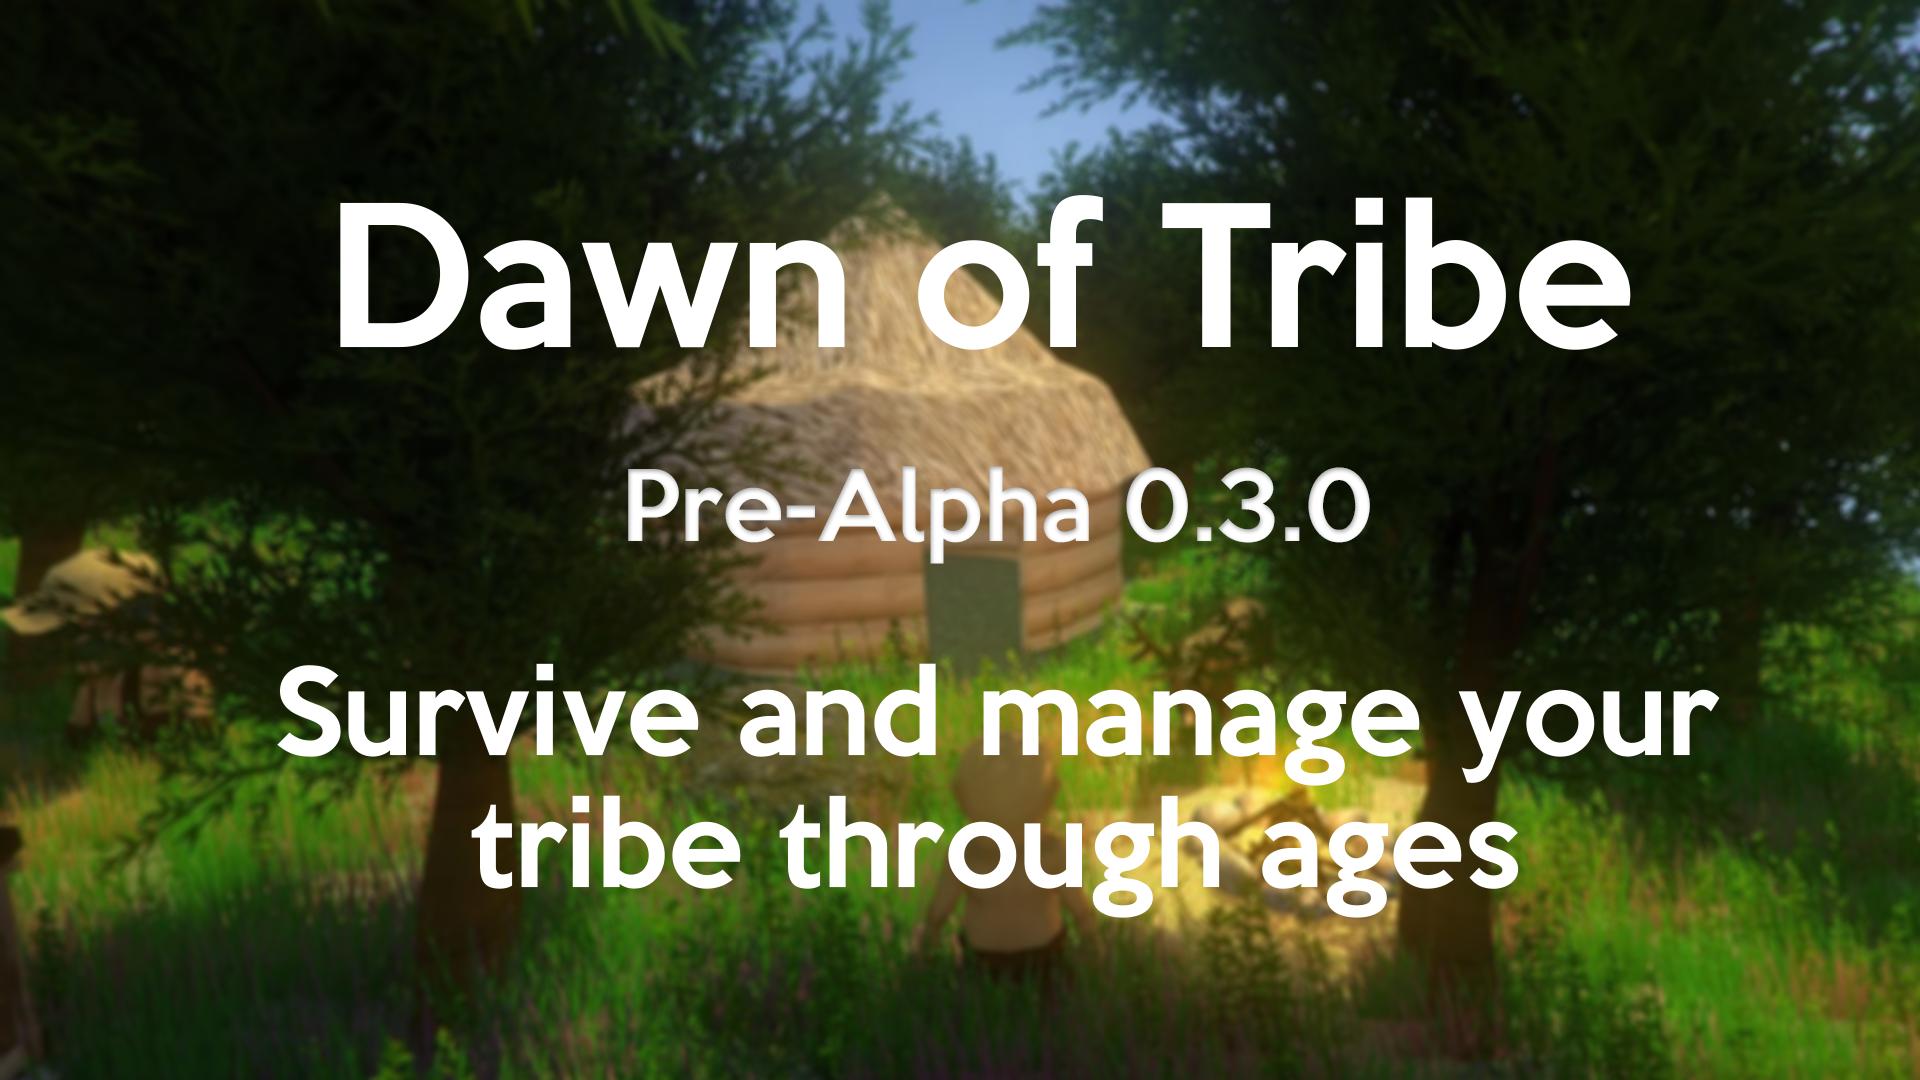 Dawn of Tribe